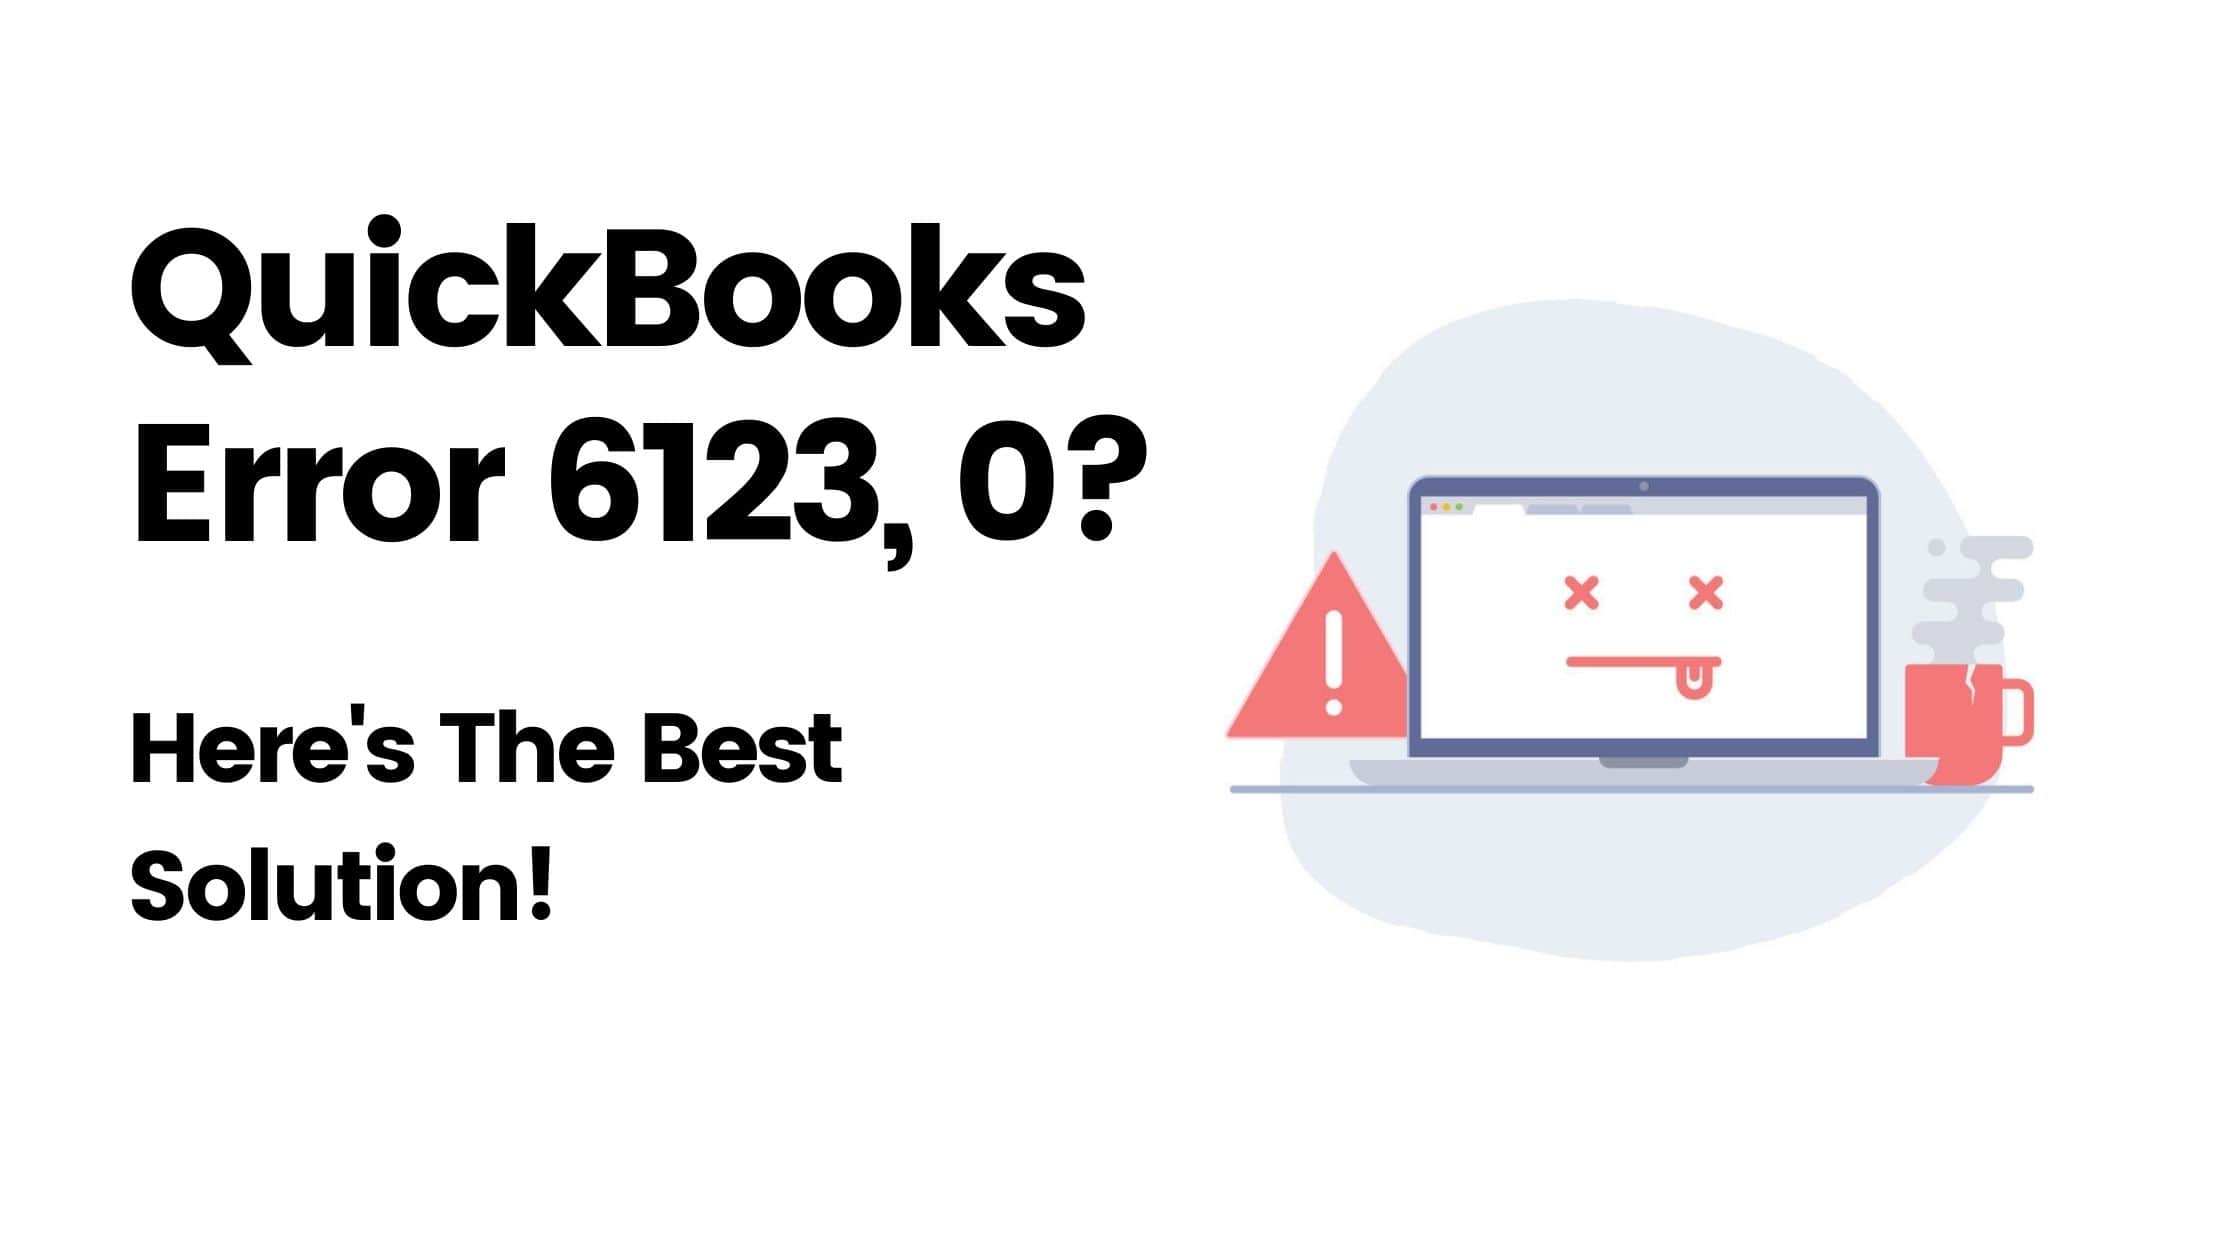 How To Fix QuickBooks Error 6123, 0?